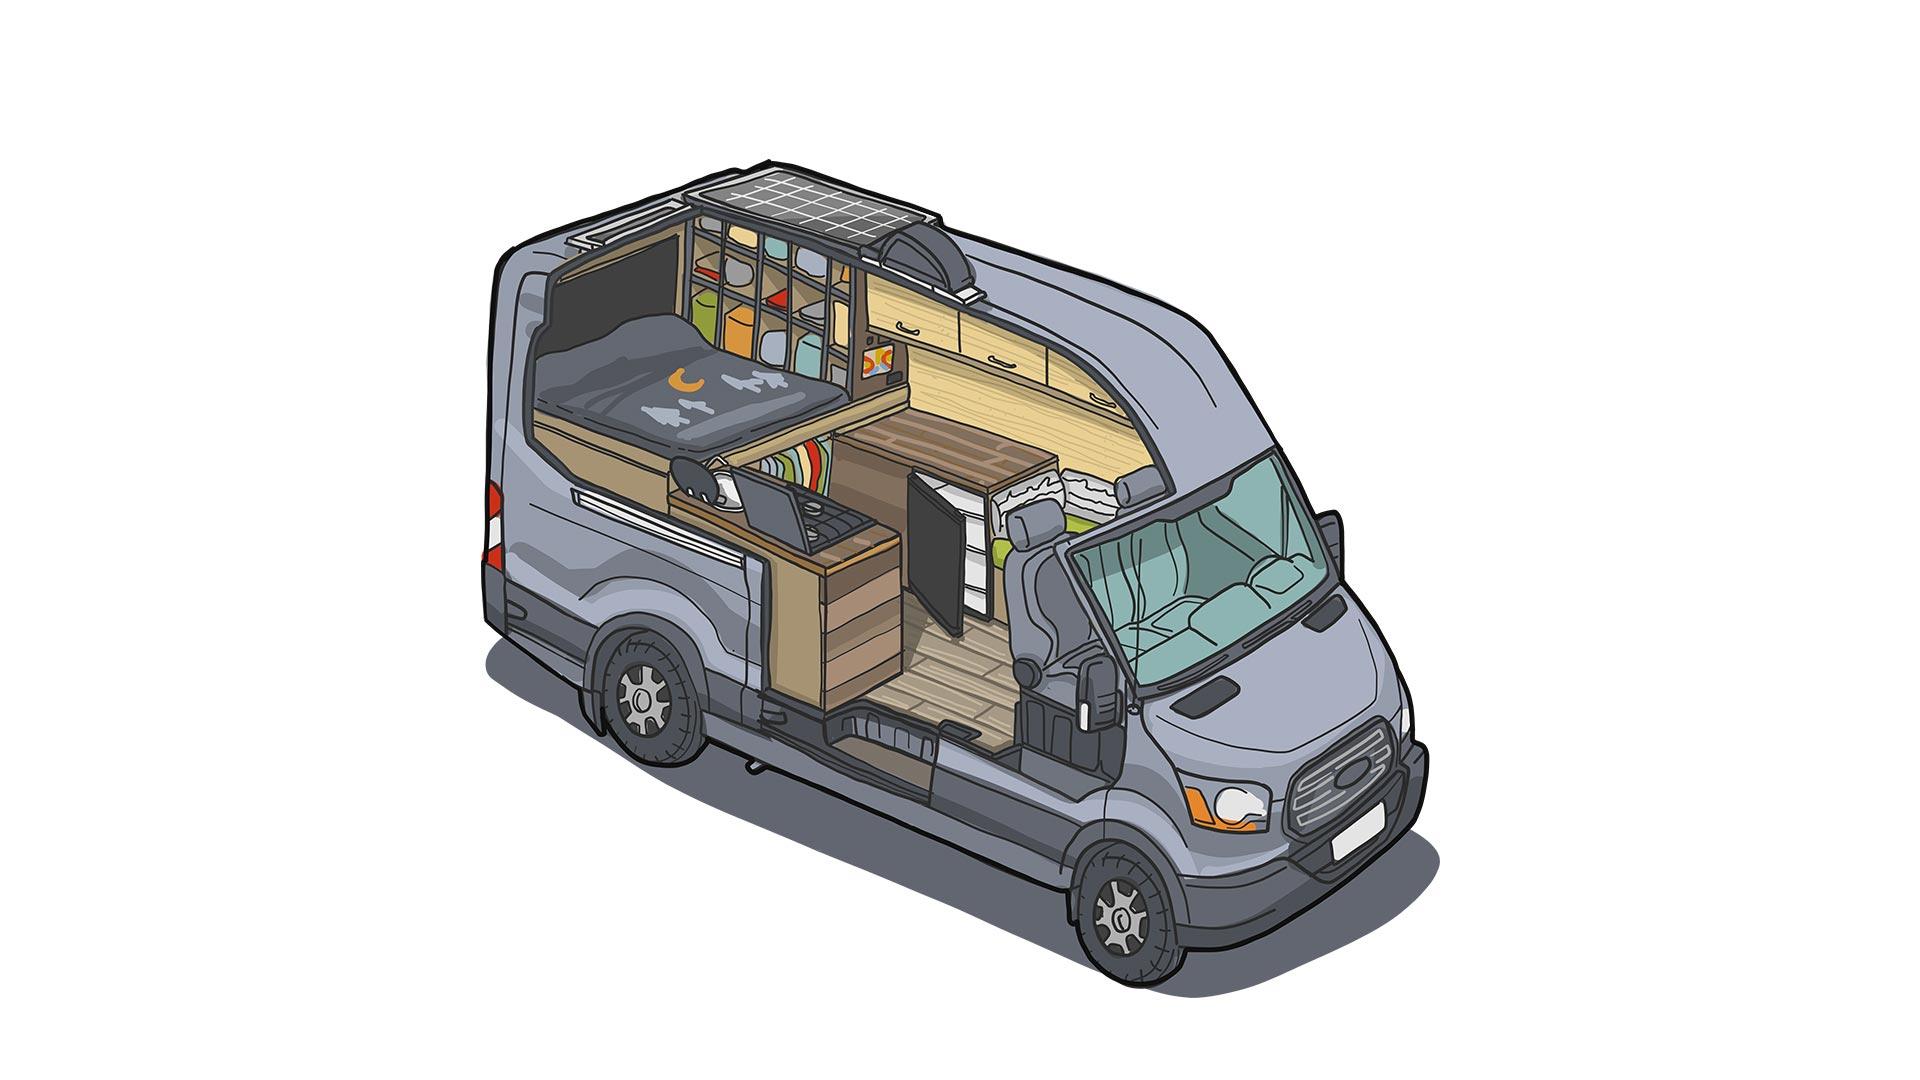 ford transit camper van diy conversion faroutride ford transit camper van diy conversion